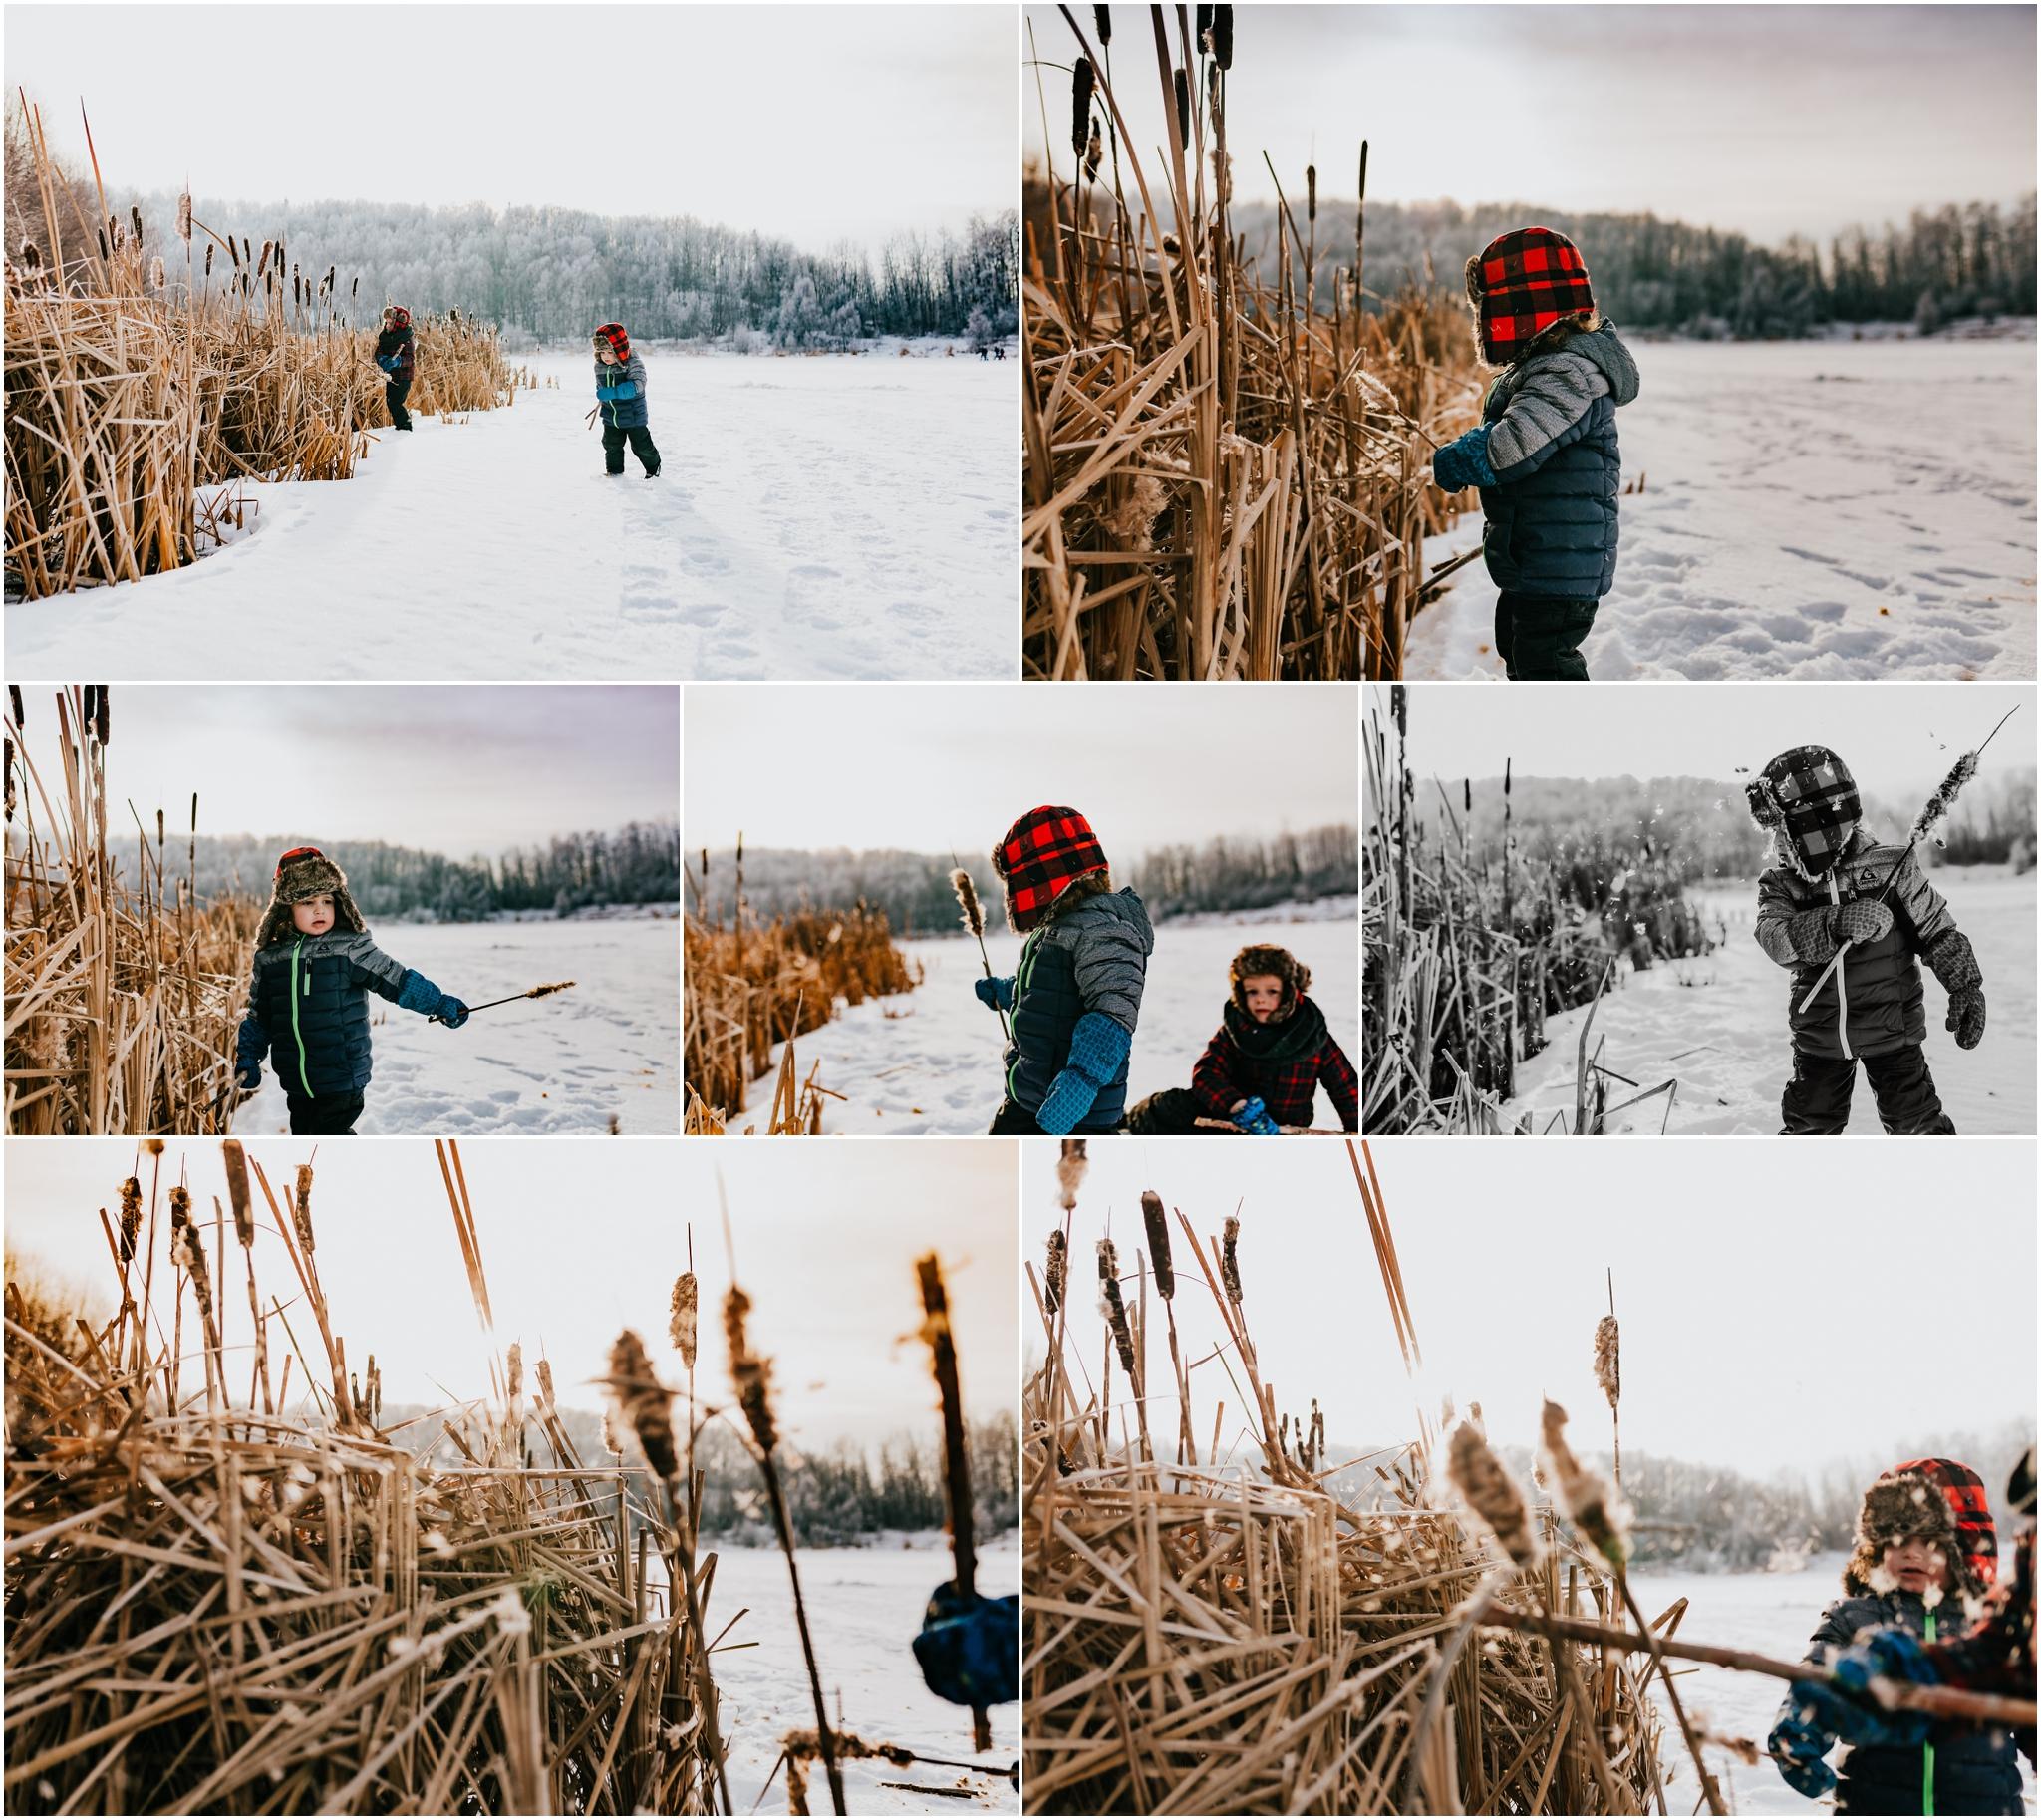 Edmonton Lifestyle Photographer - Edmonton Family Photographer - Kids on frozen lake - Cattails.jpg